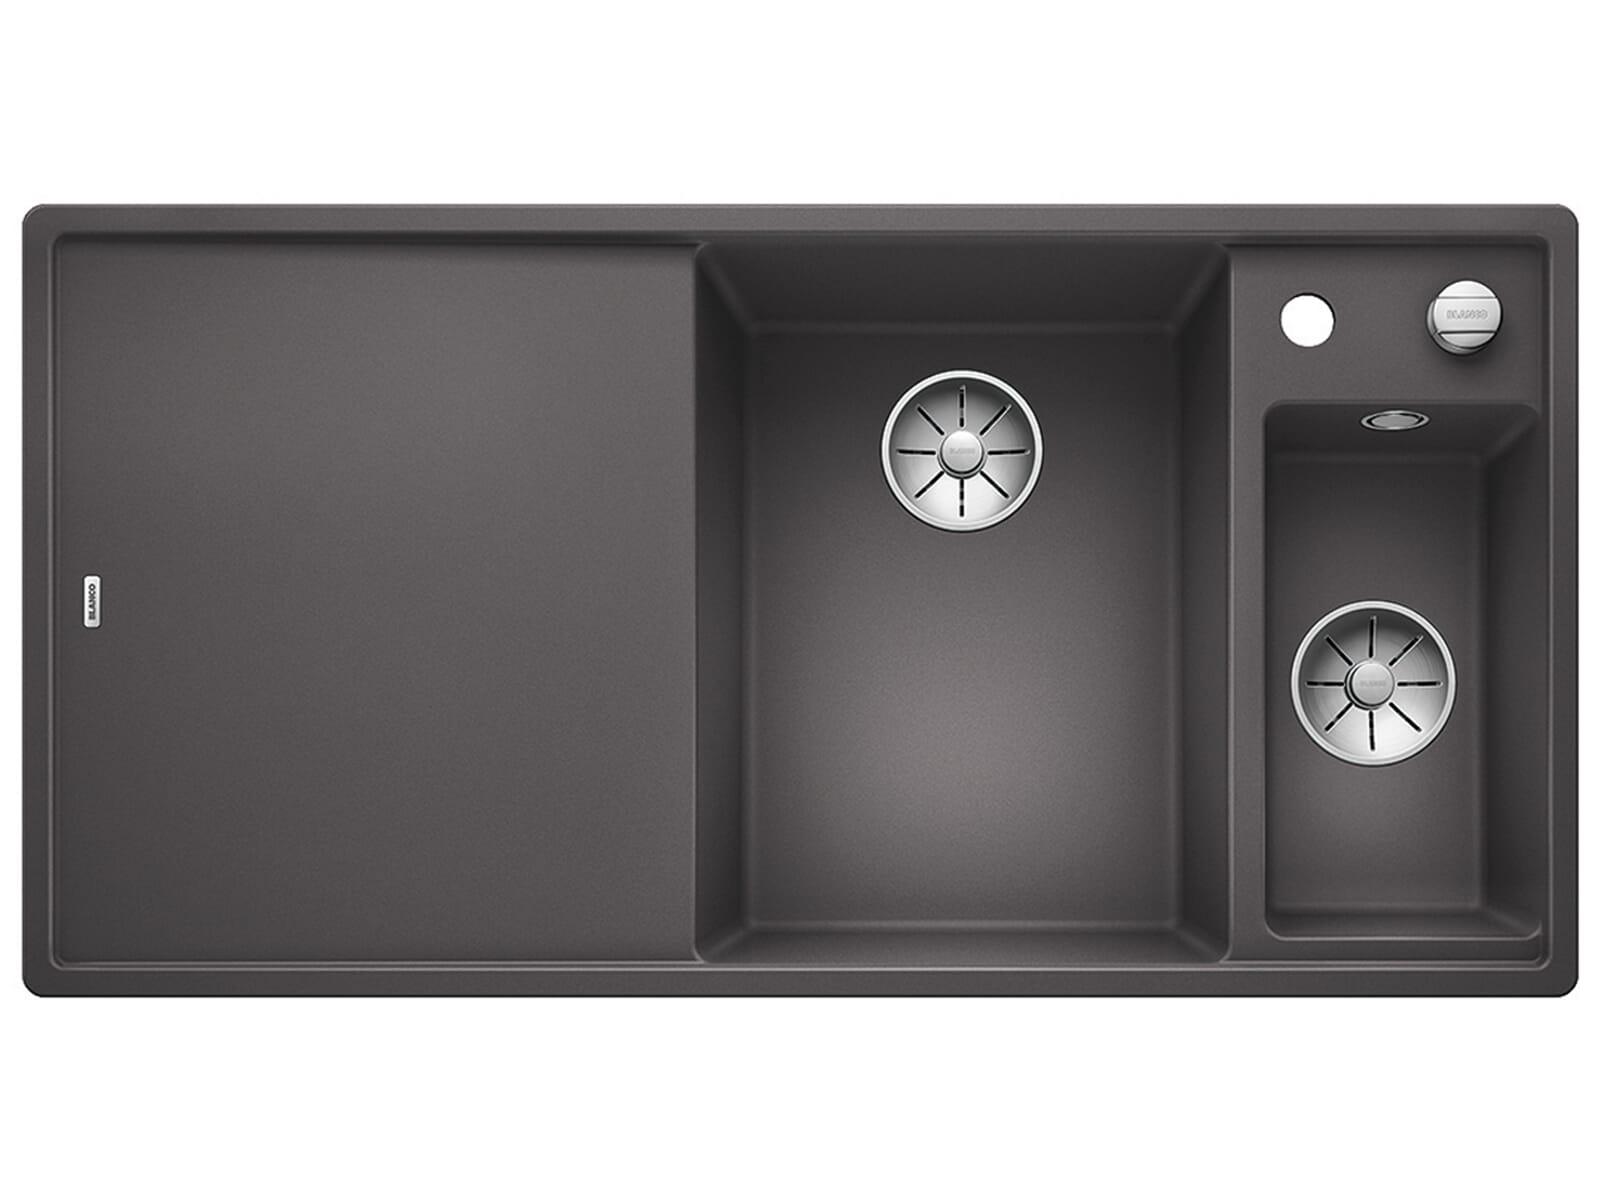 Produktabbildung Blanco Axia III 6 S-F Felsgrau - 523 484 Granitspüle